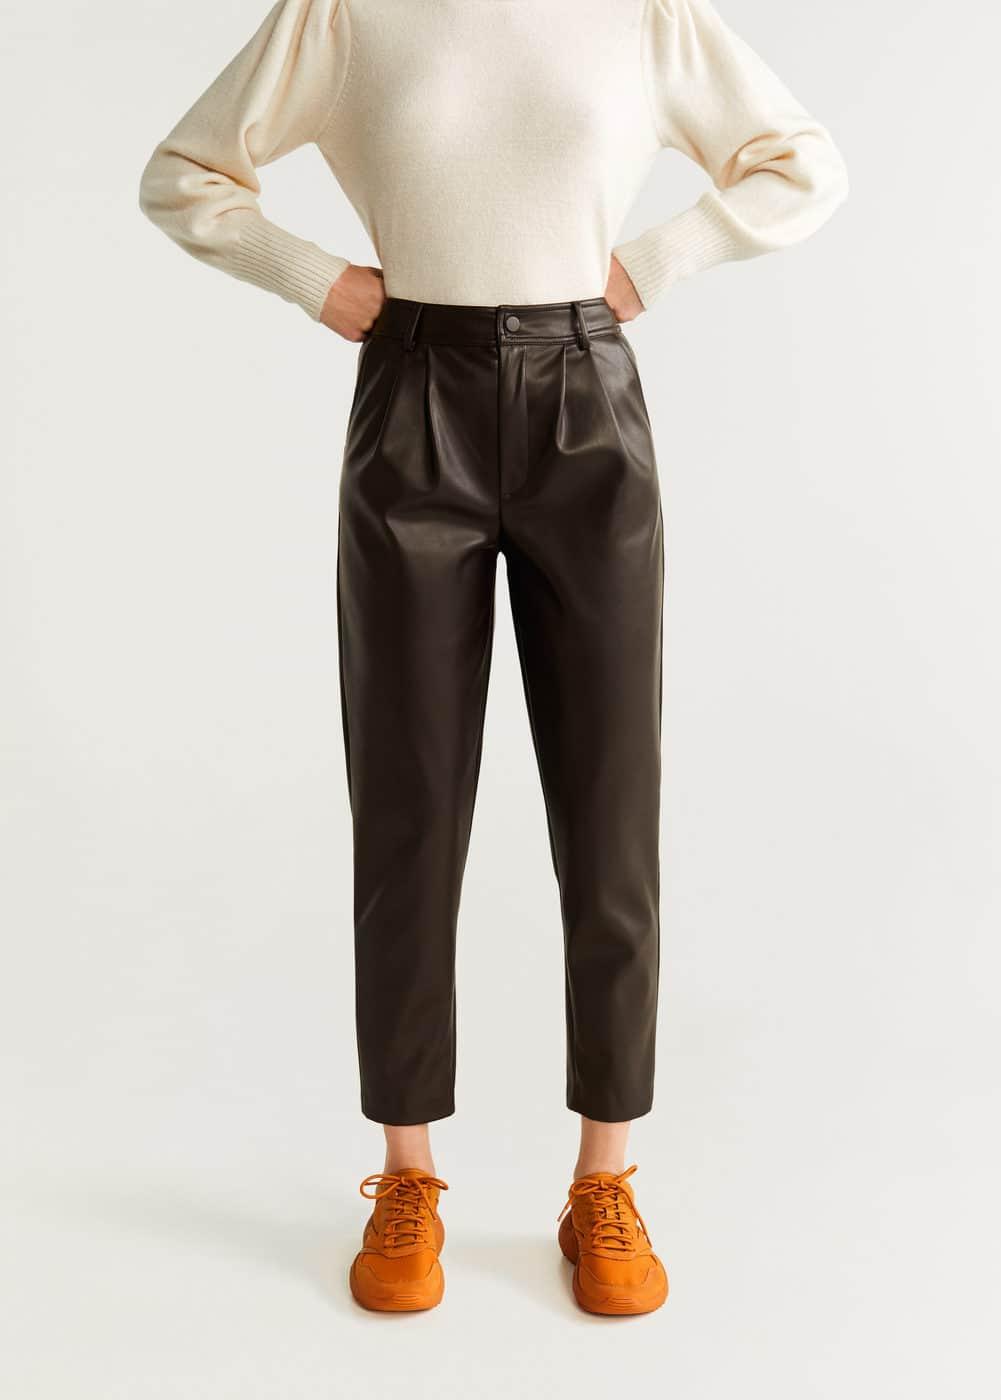 m-martina:pantalon tiro alto pinzas